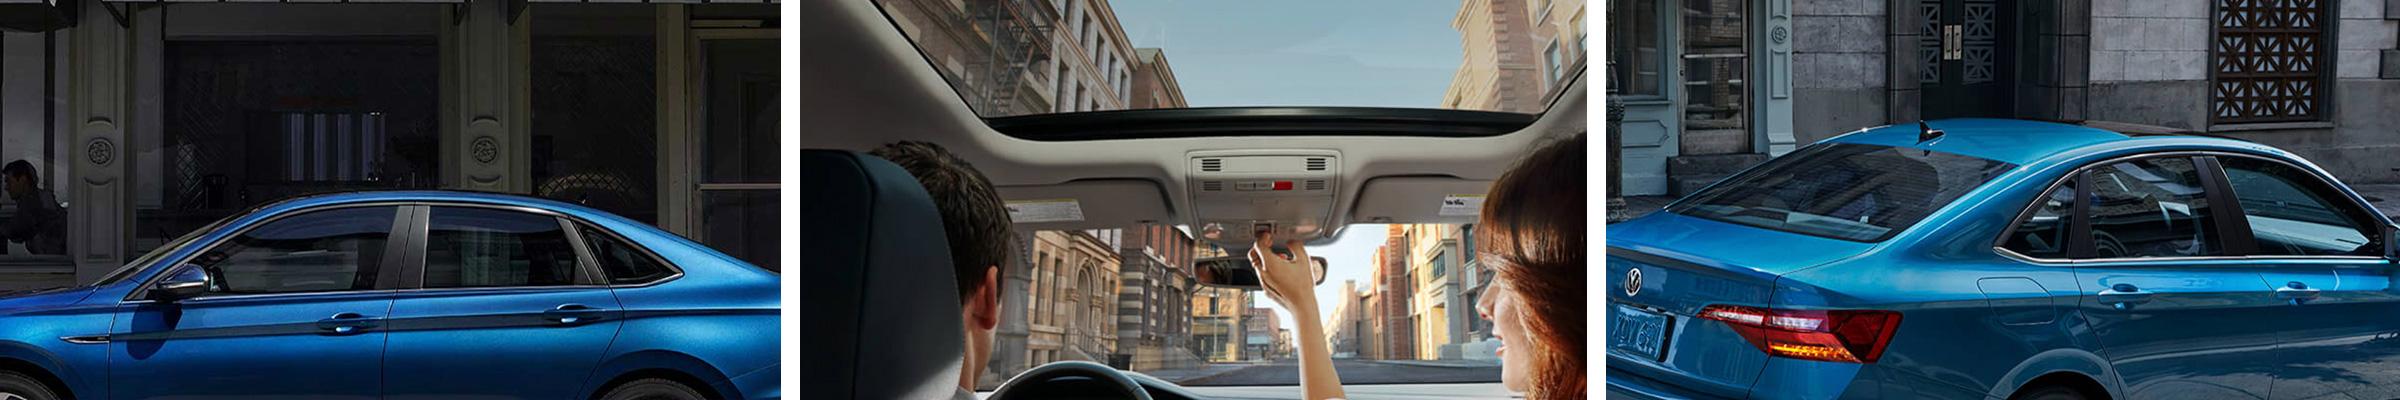 2020 Volkswagen Jetta For Sale Amarillo TX | Lubbock